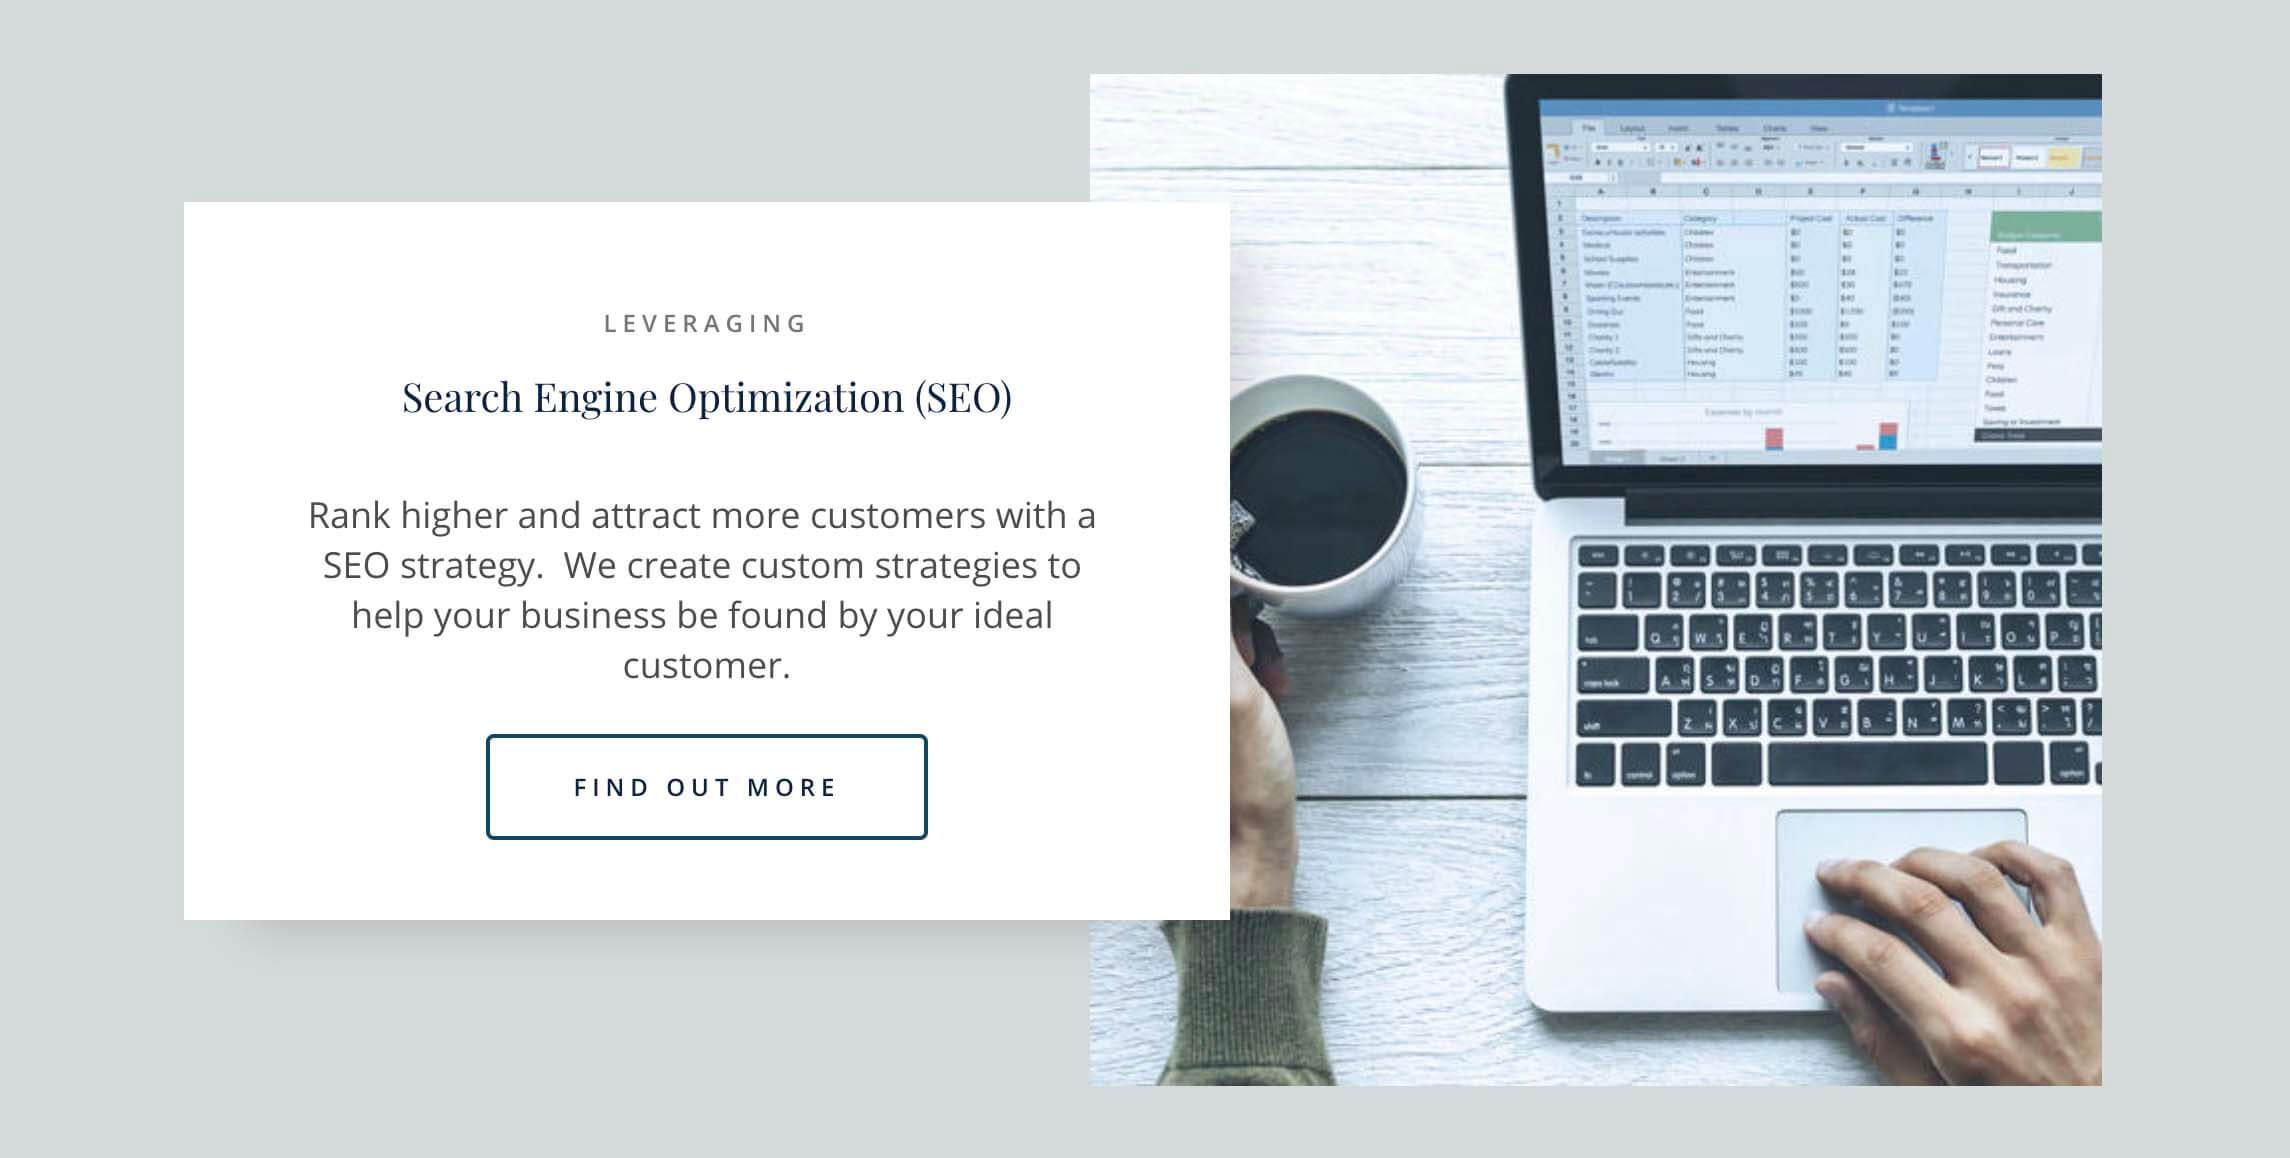 2020 Web Design Trends - Images Overlap